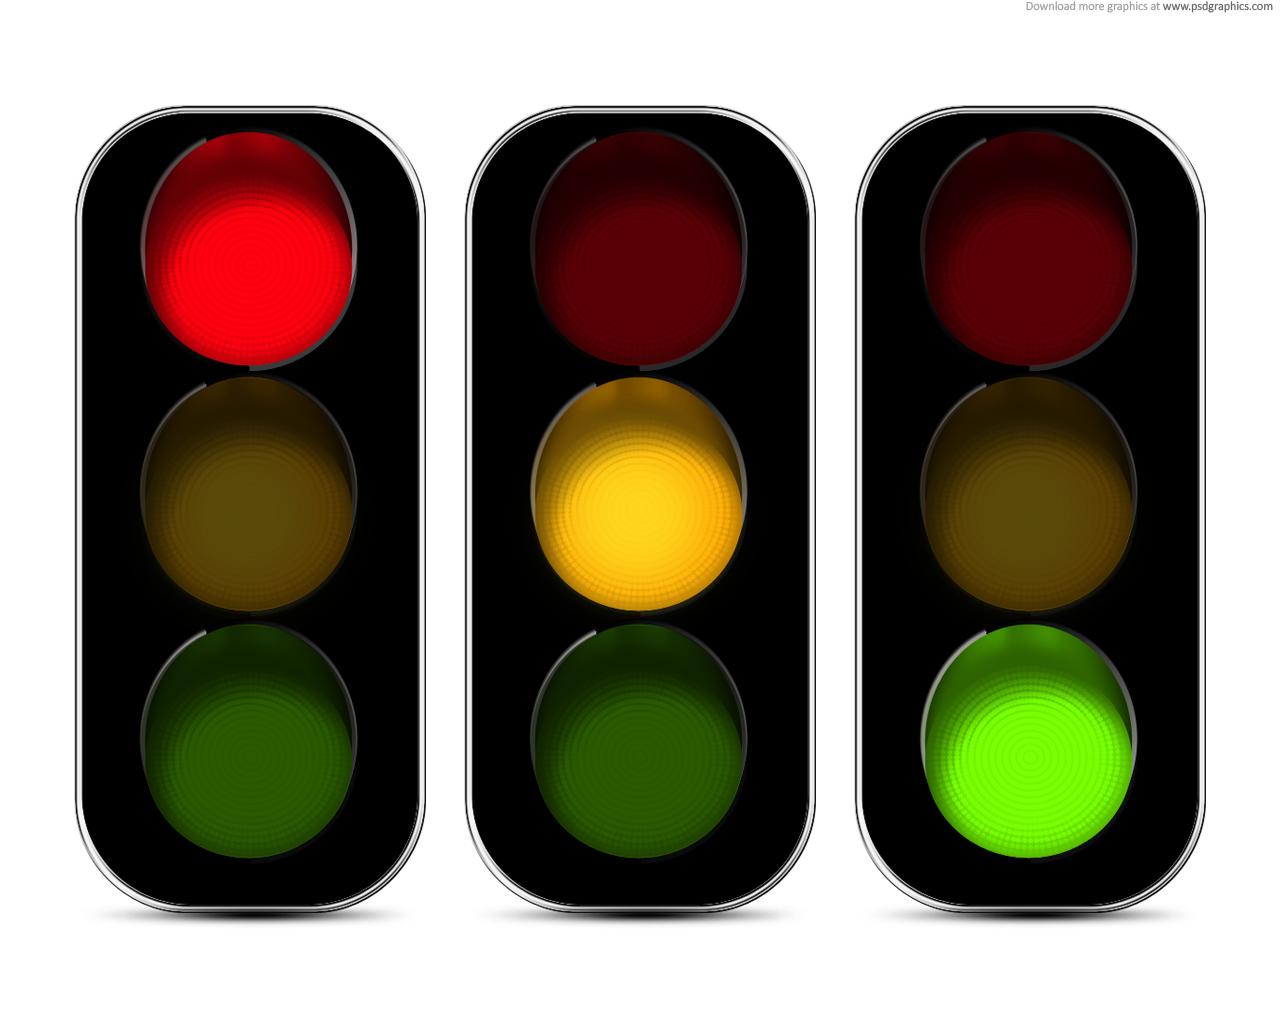 clipart traffic light green - photo #31